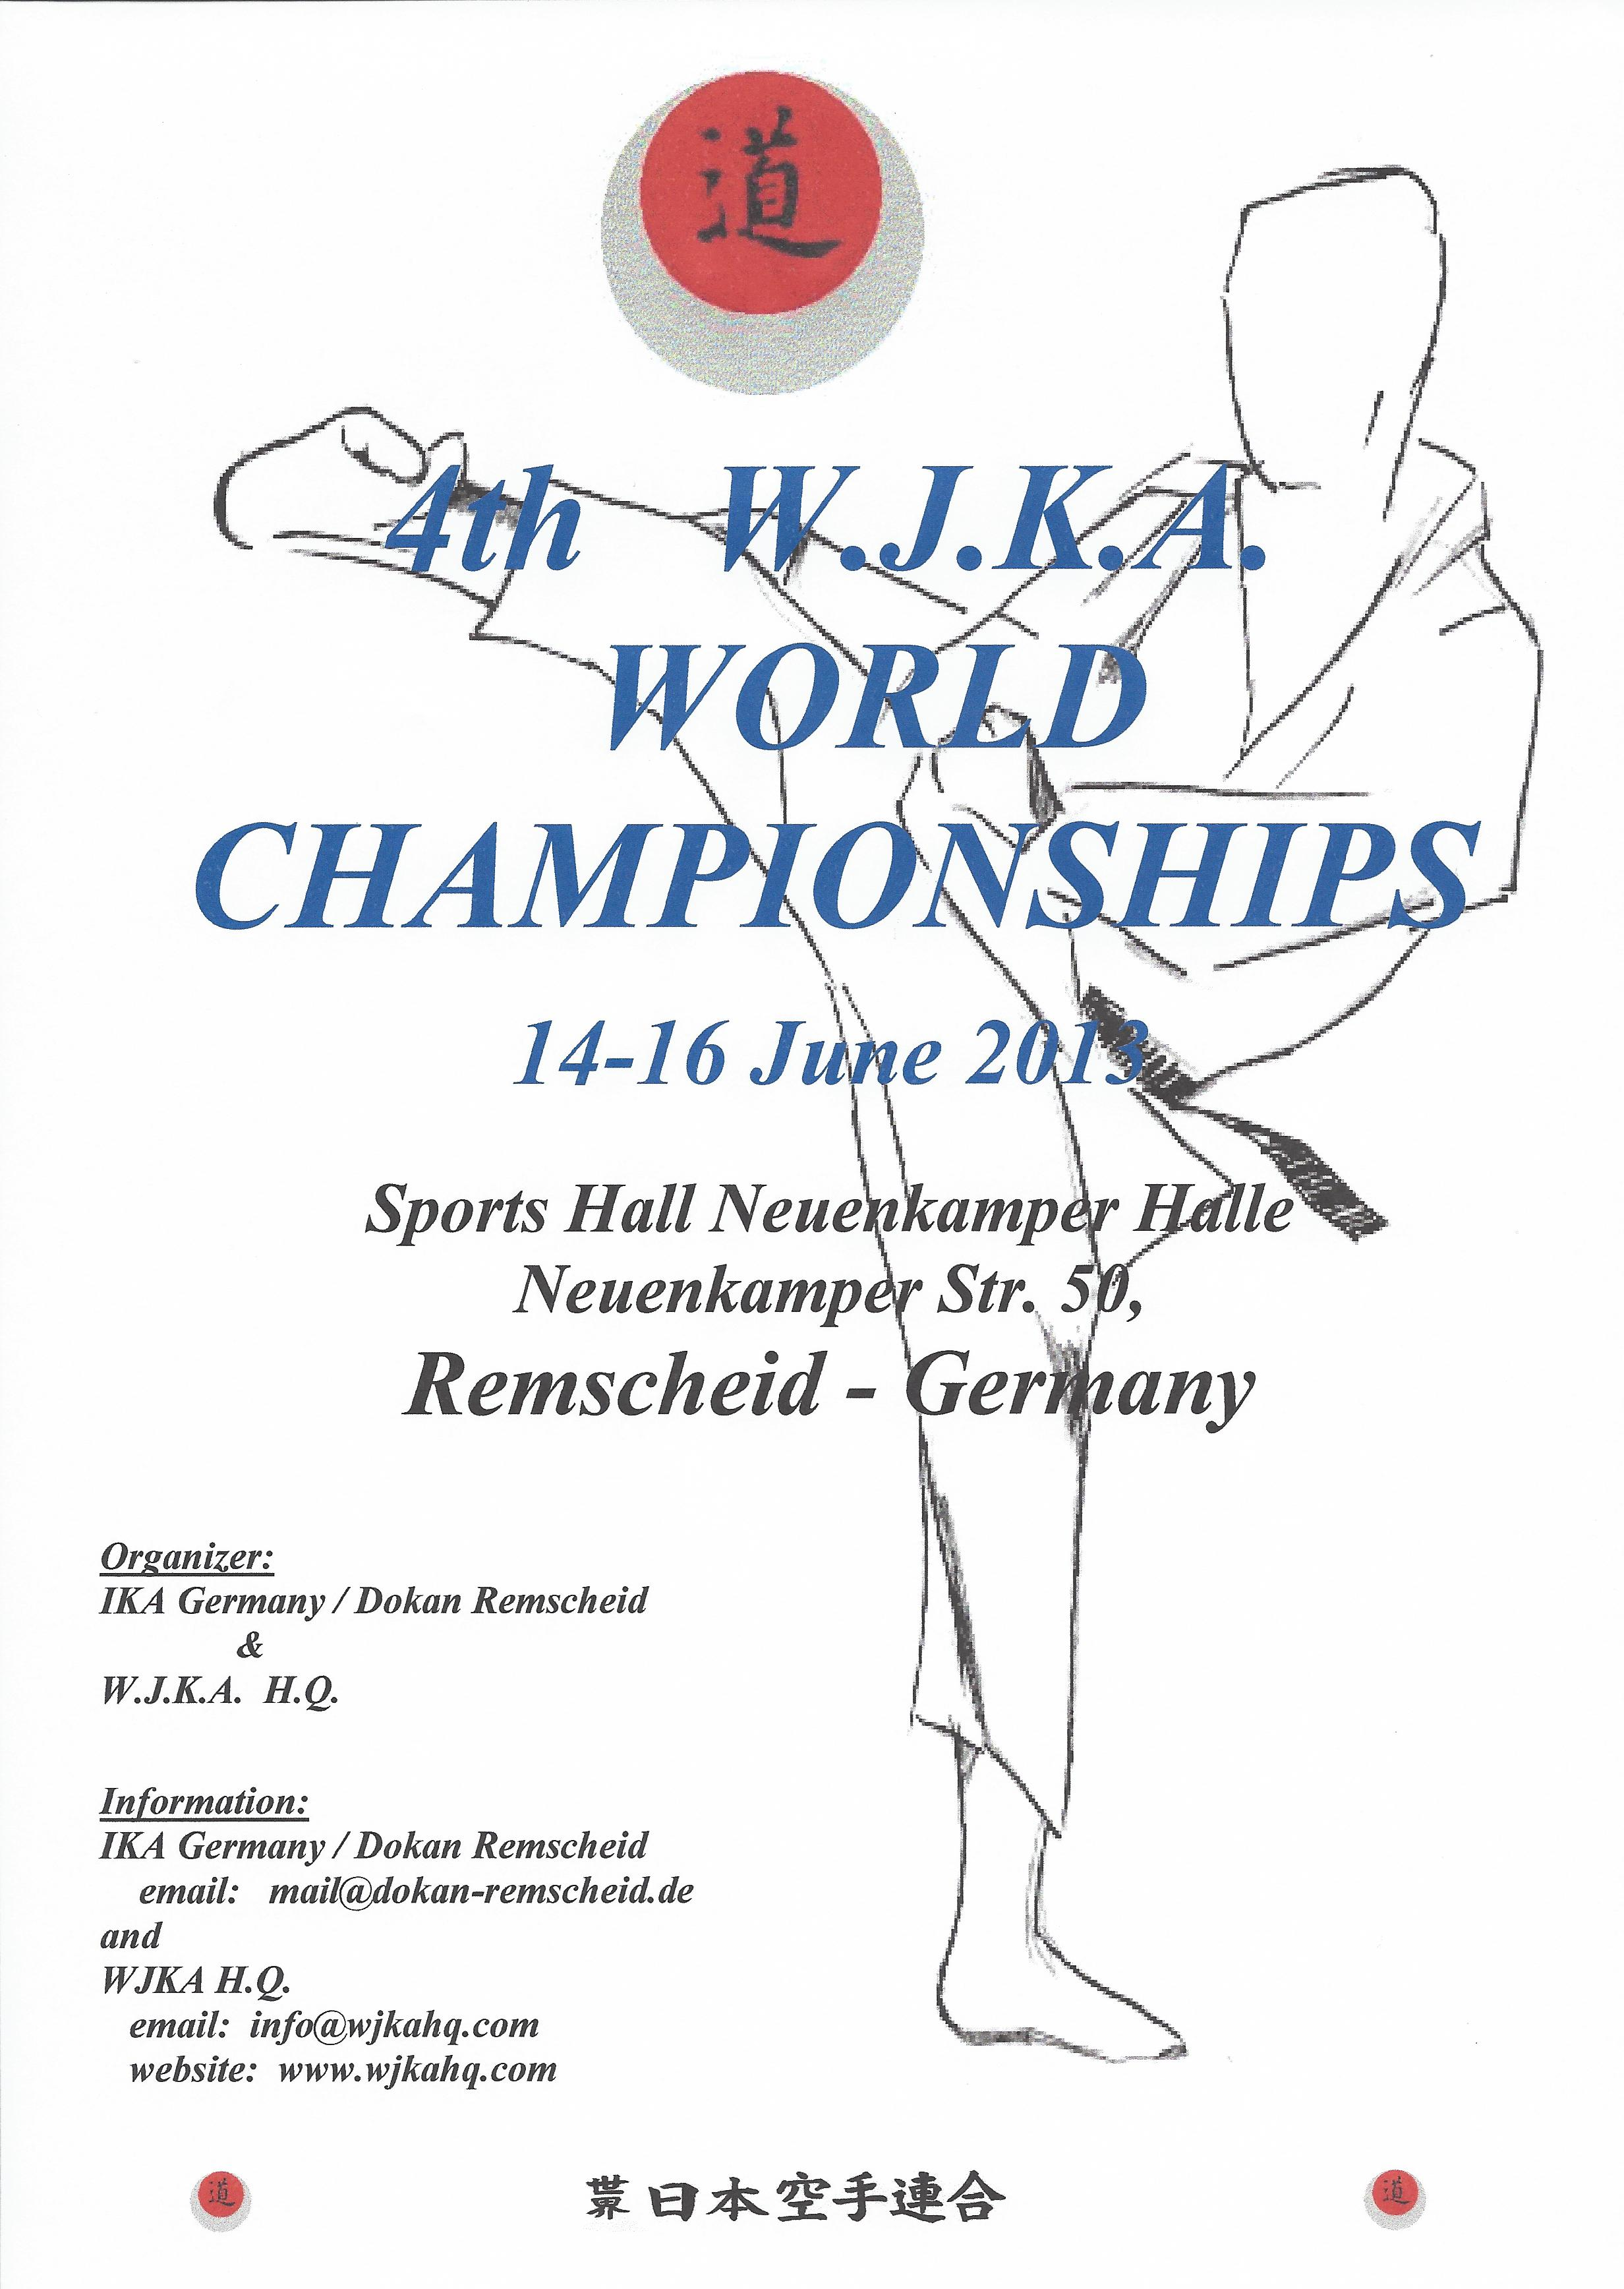 2013-06 4. WJKA World Championship